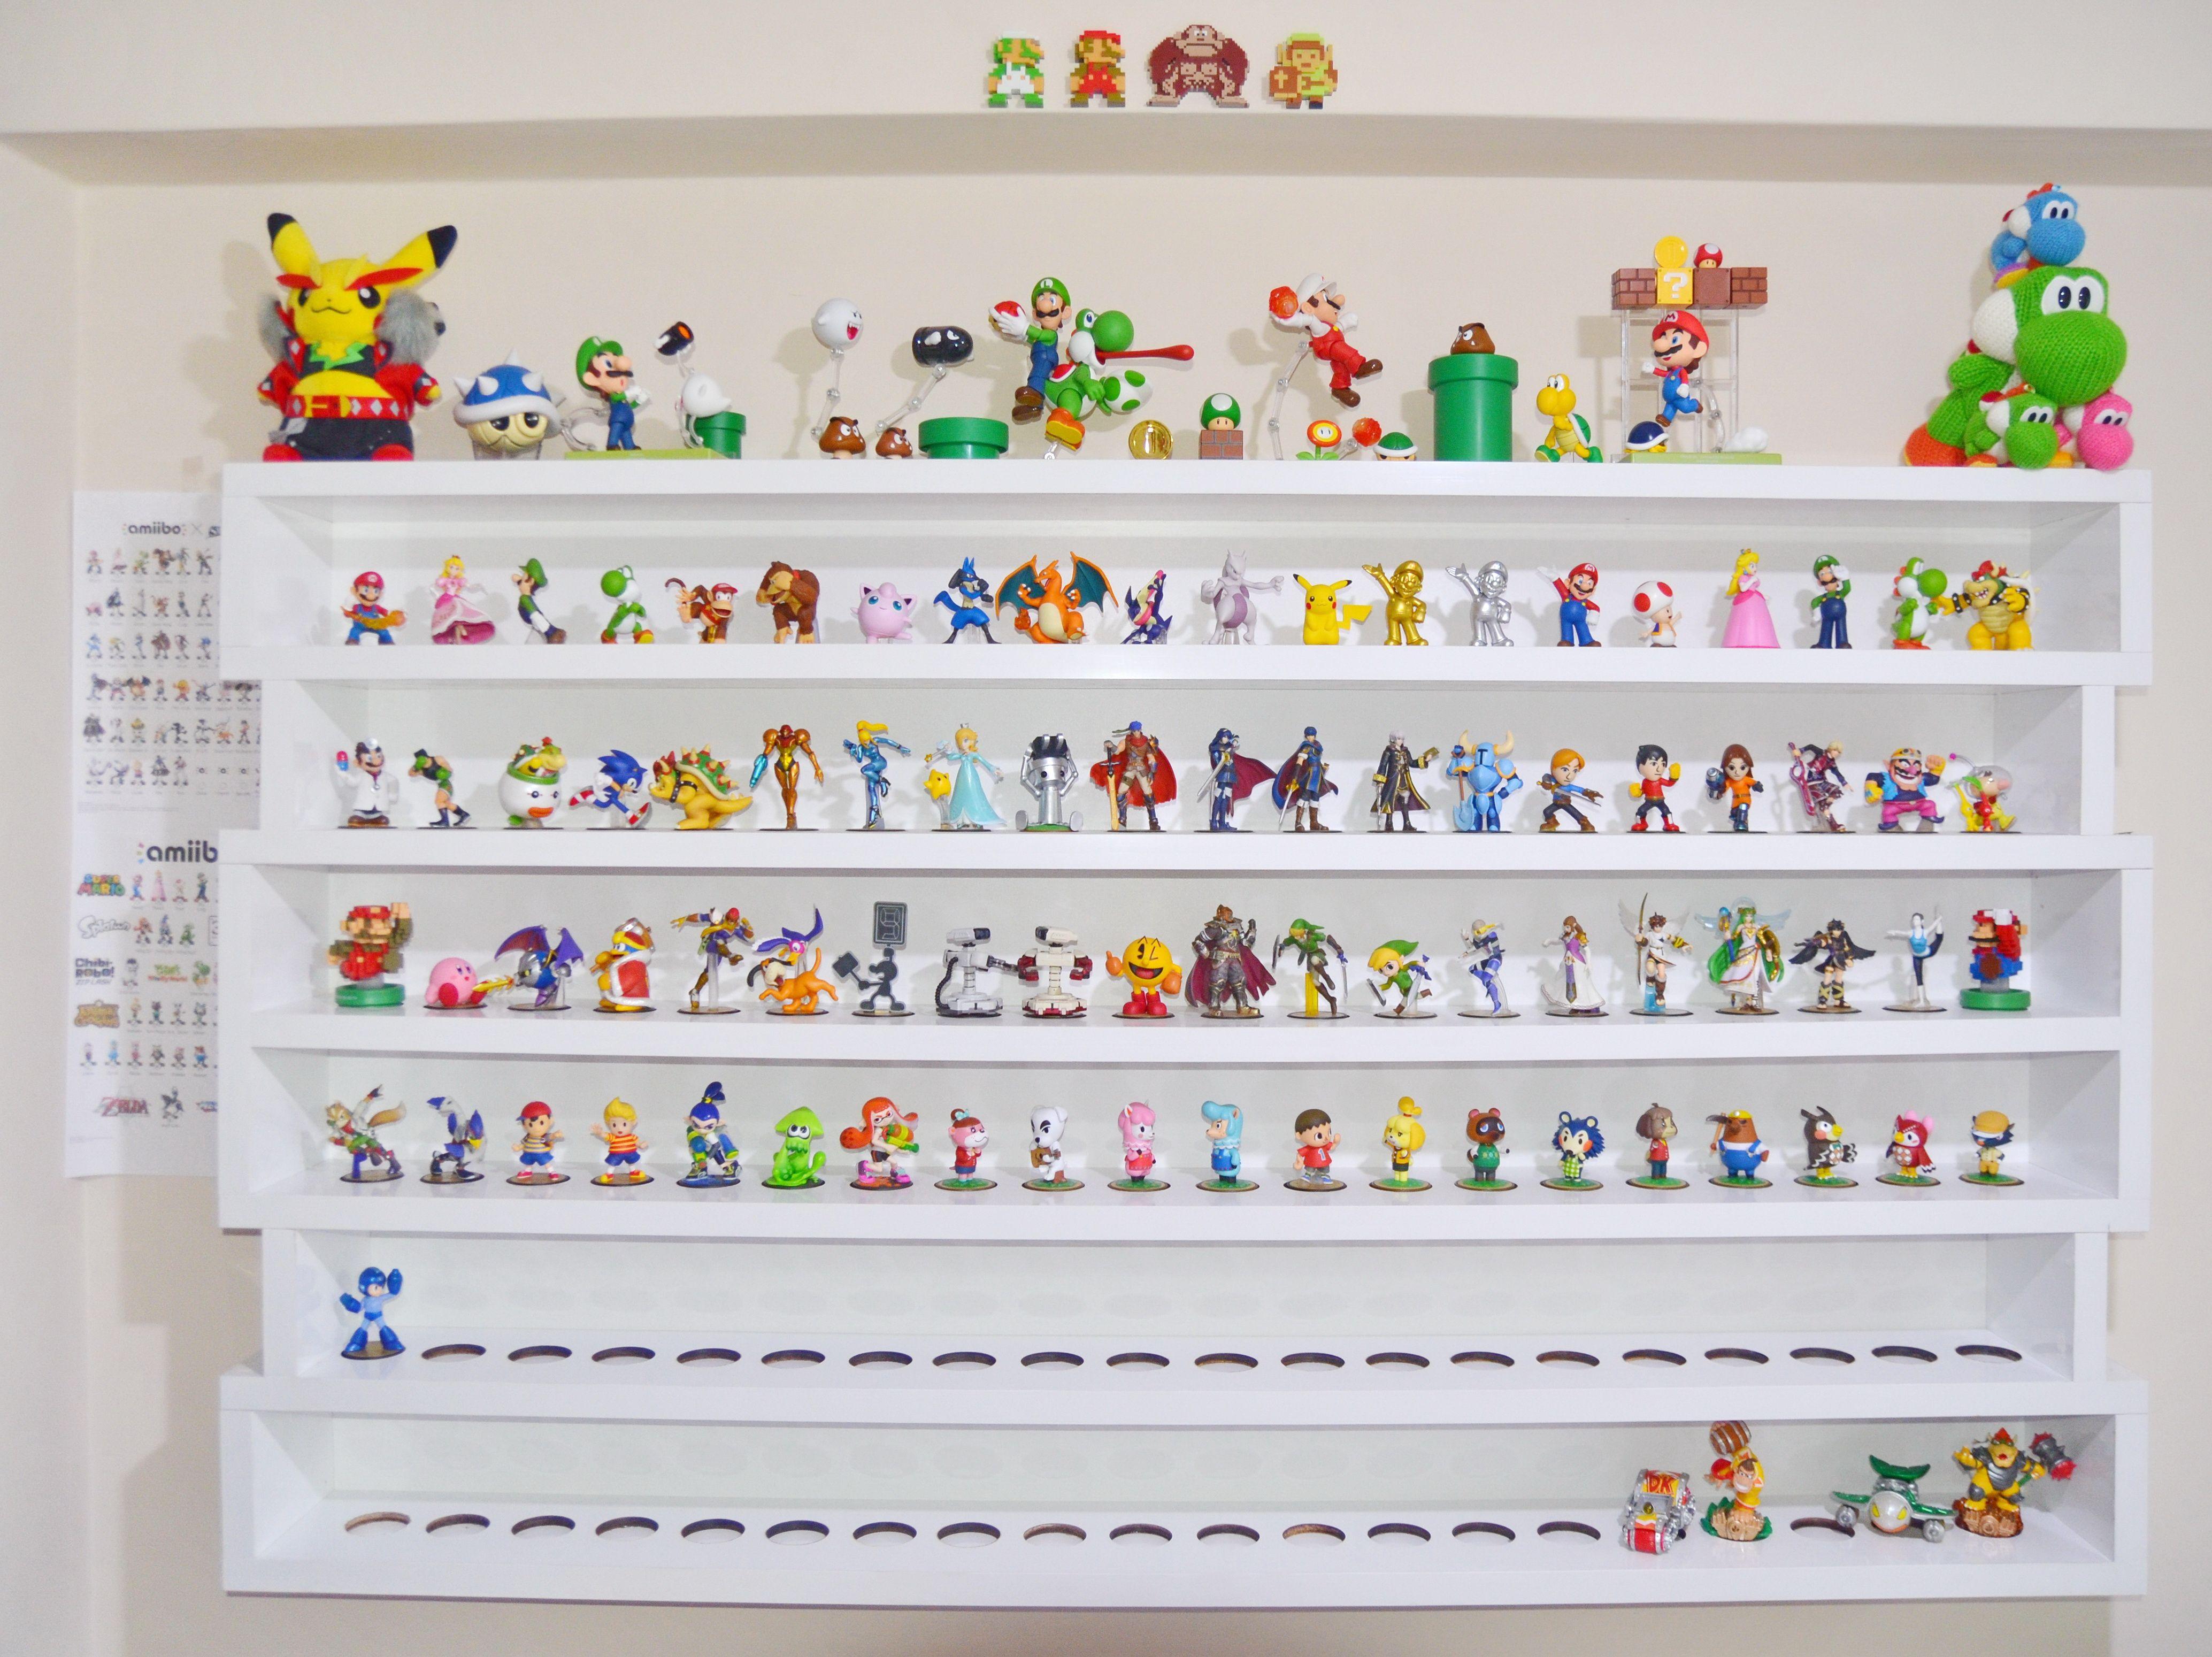 Filling up Amiibo shelves Clean organized display via Reddit user